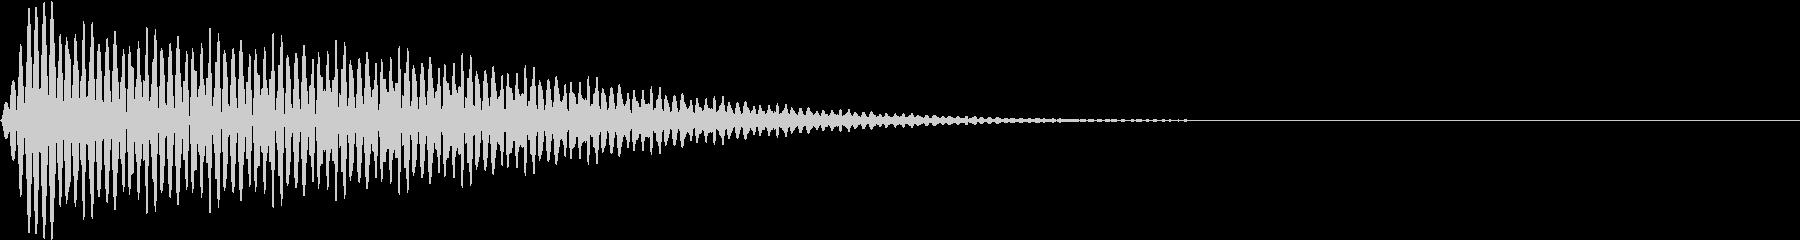 App キャンセル エラー音 ブー!の未再生の波形